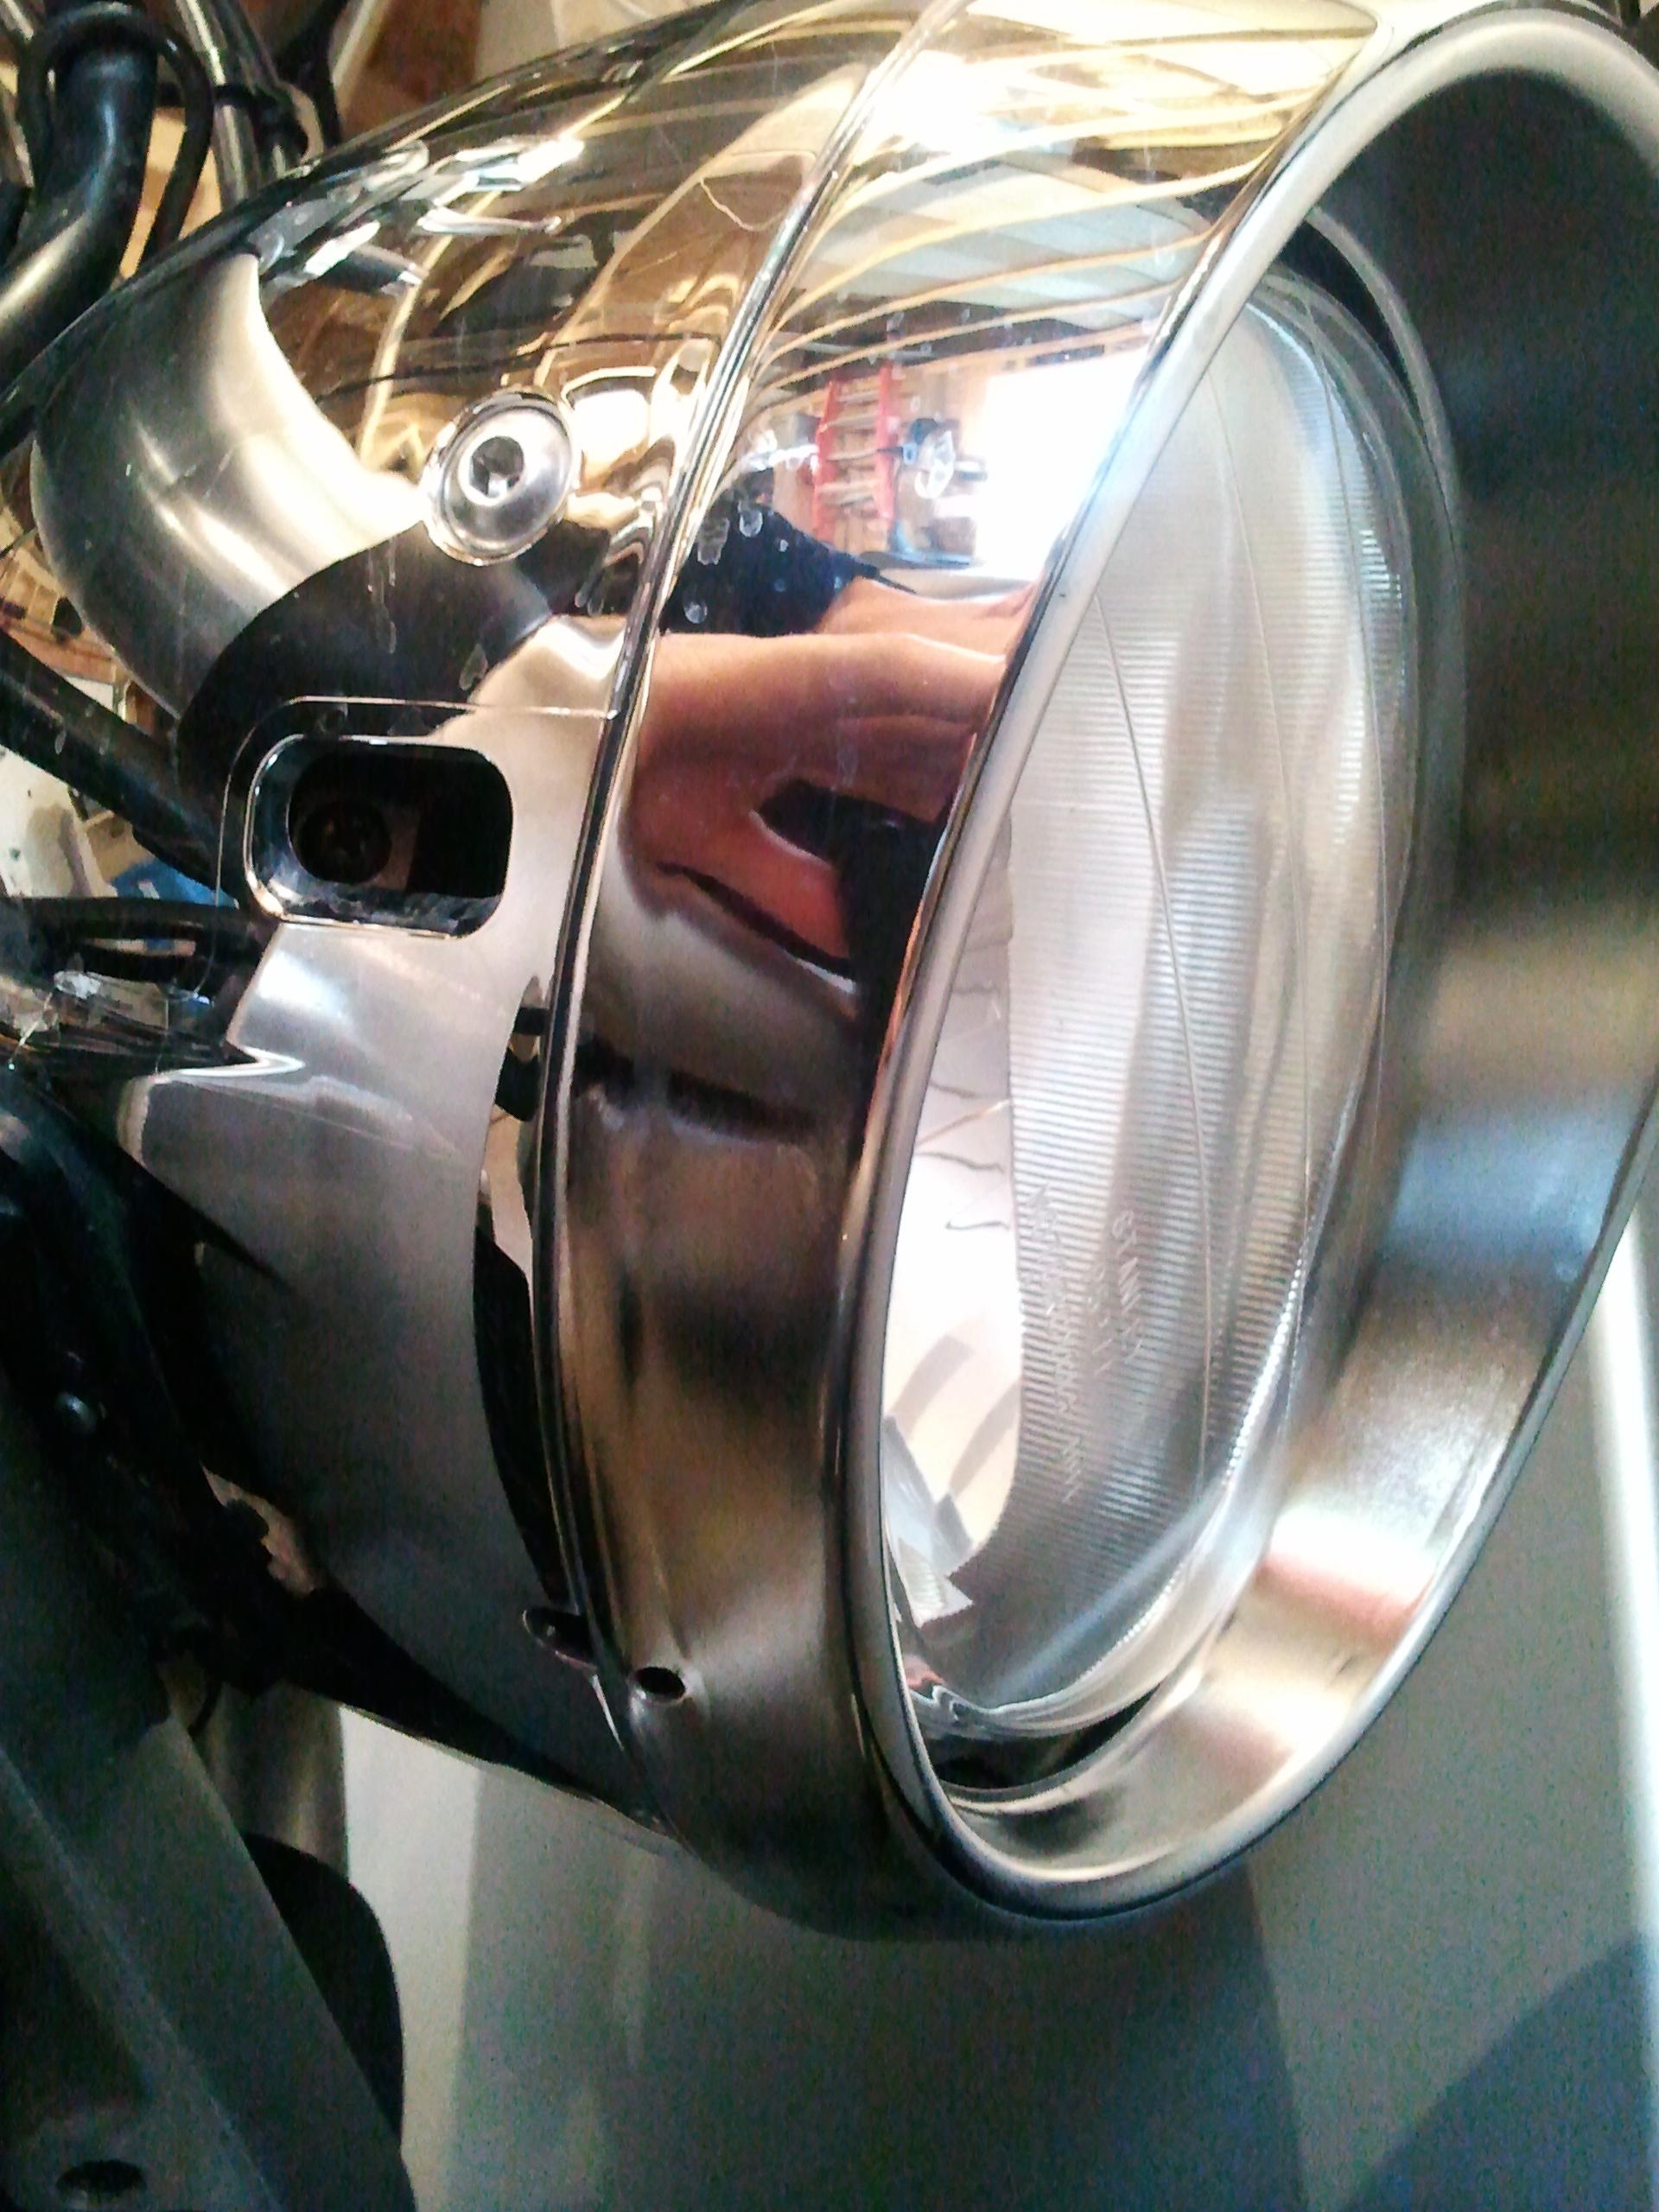 Help 2007 M50 Headlight Bulb Replacement 2009 Suzuki Wiring Diagram 2011 07 12 1740